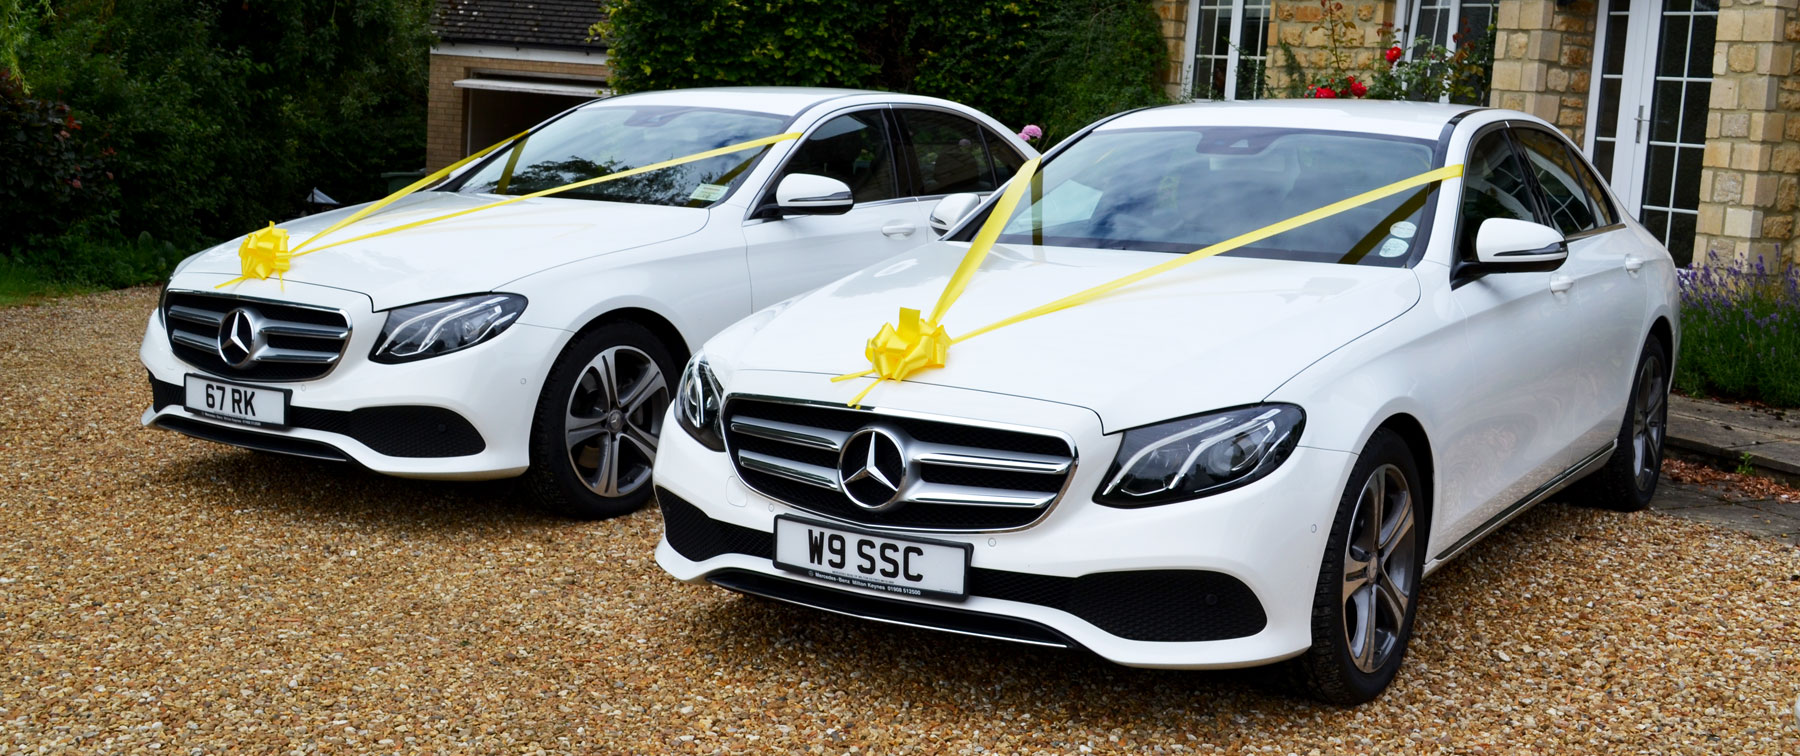 Exclusive Cars Mercedes Wedding Car